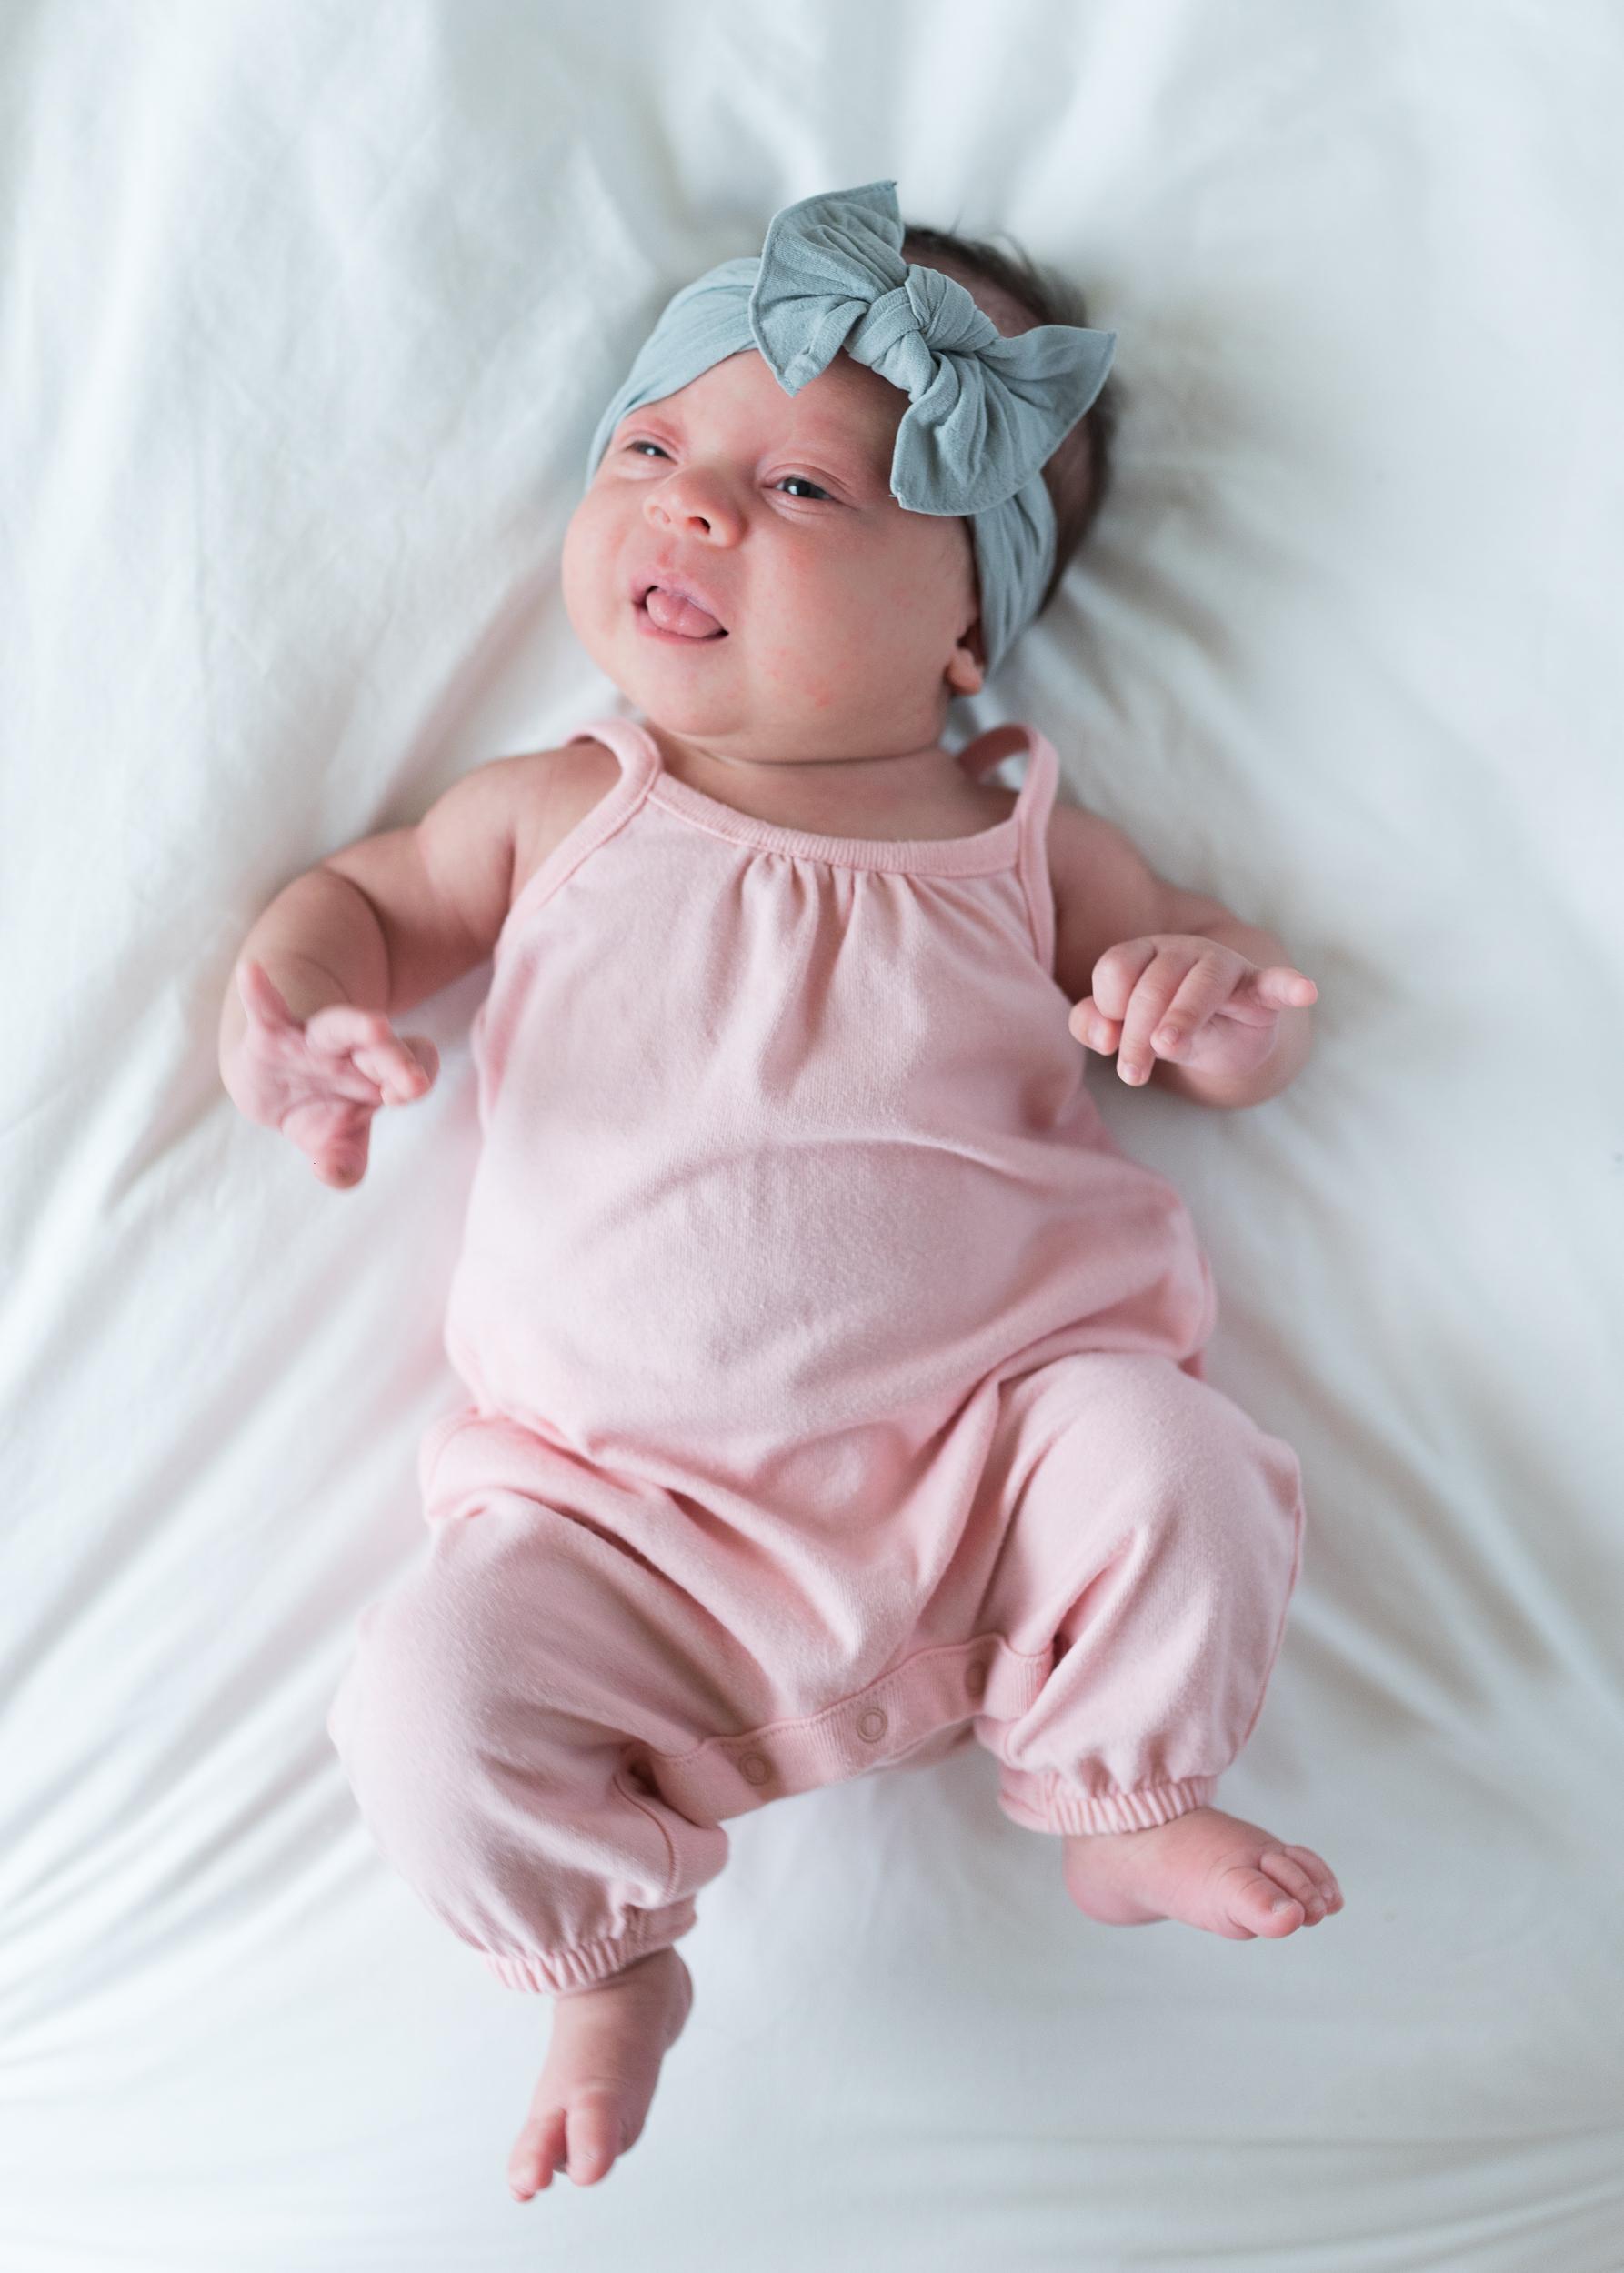 baby-year-one-motherhood-roxanne-augusta-guam-photography-5.jpg